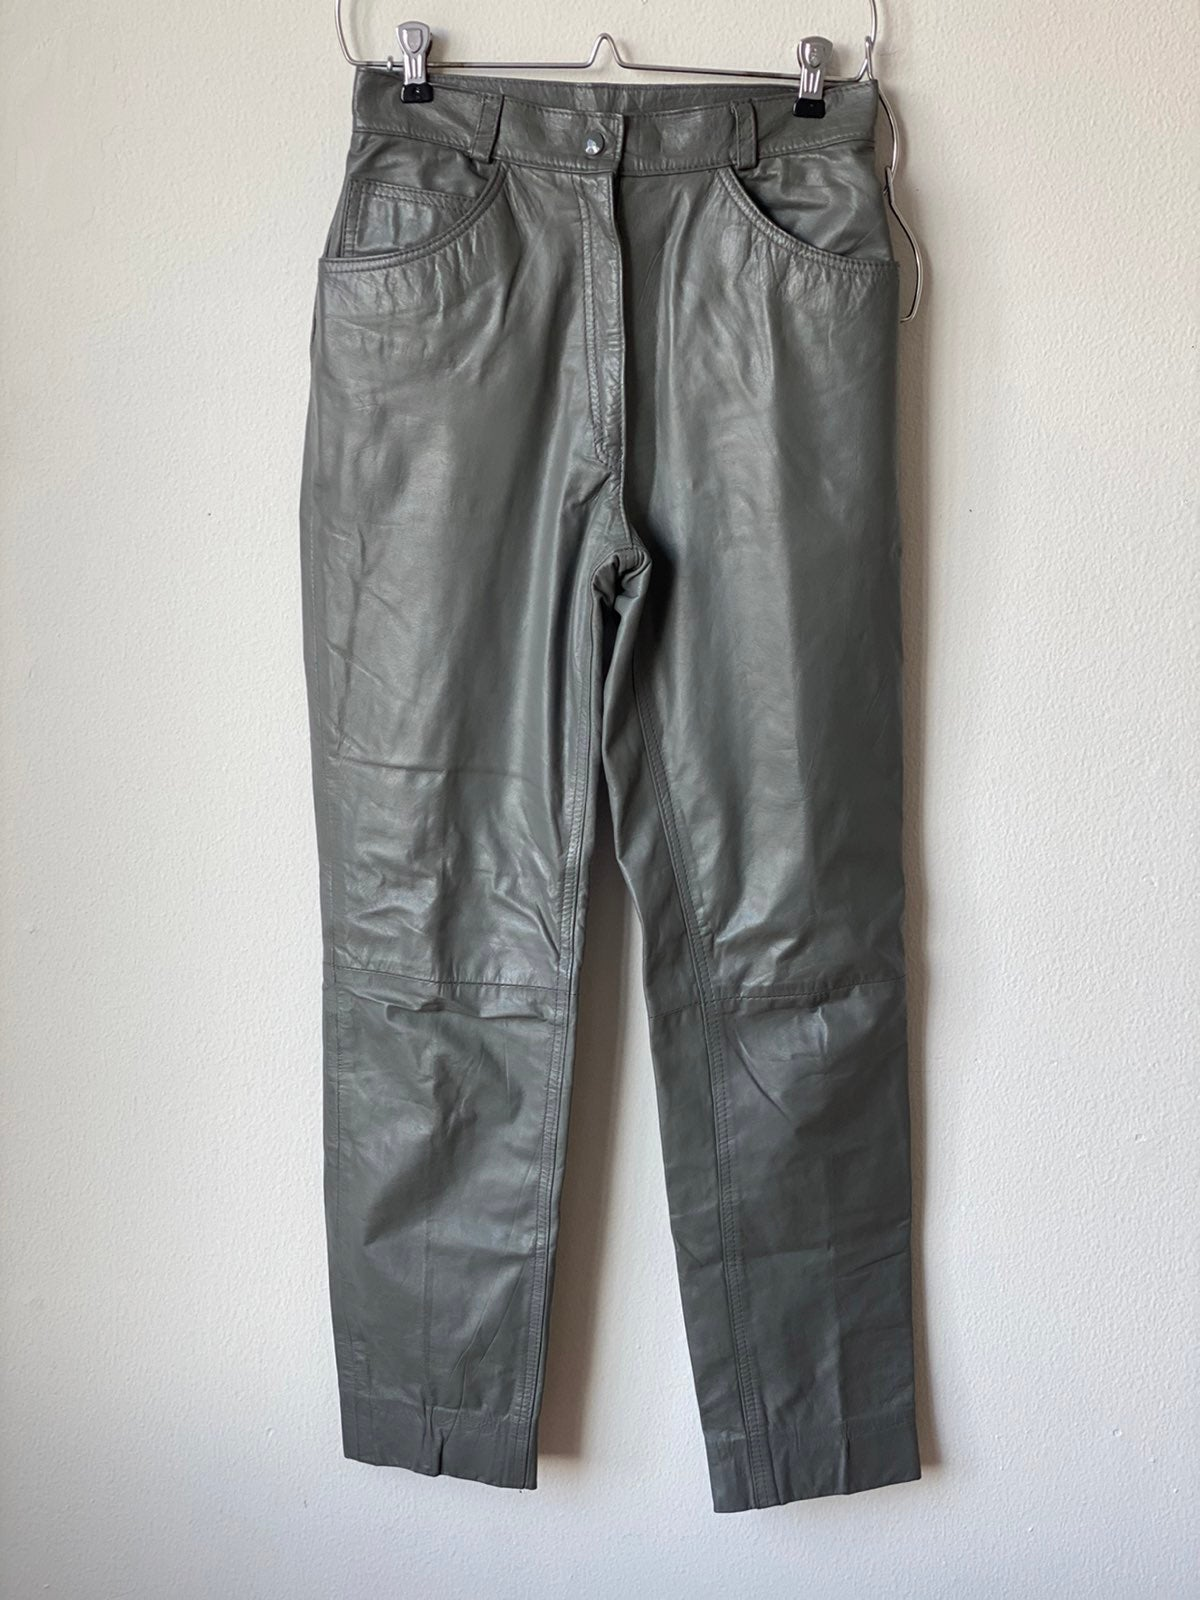 Vintage Golden Bear Leather Pants Sz 8